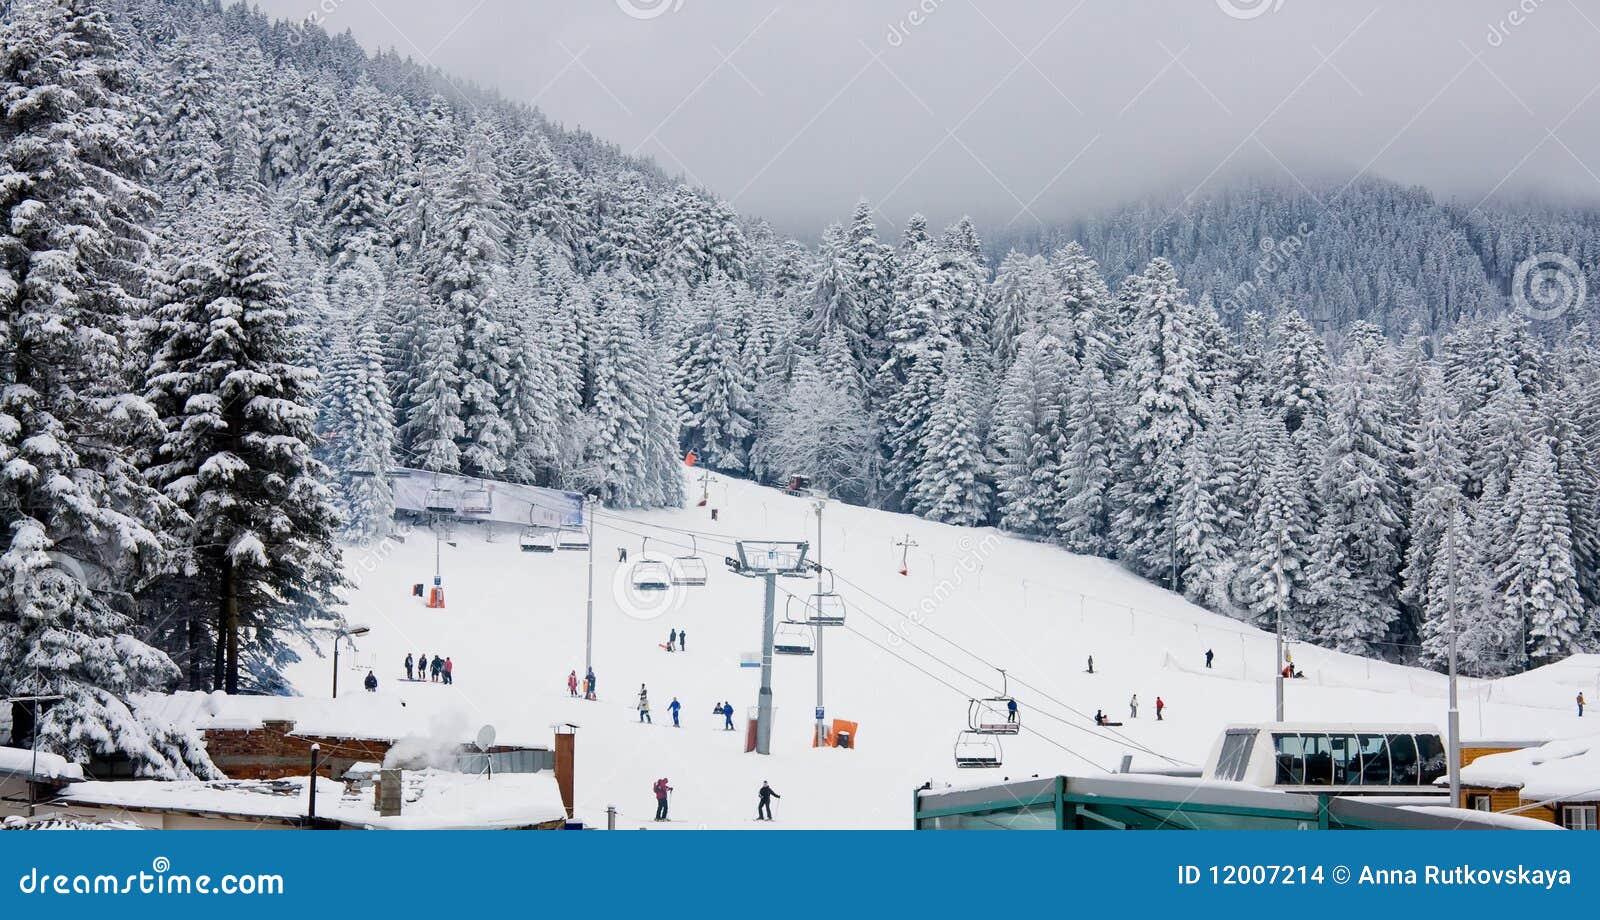 Ski slope and chair ski lift in Borovets, Bulgaria